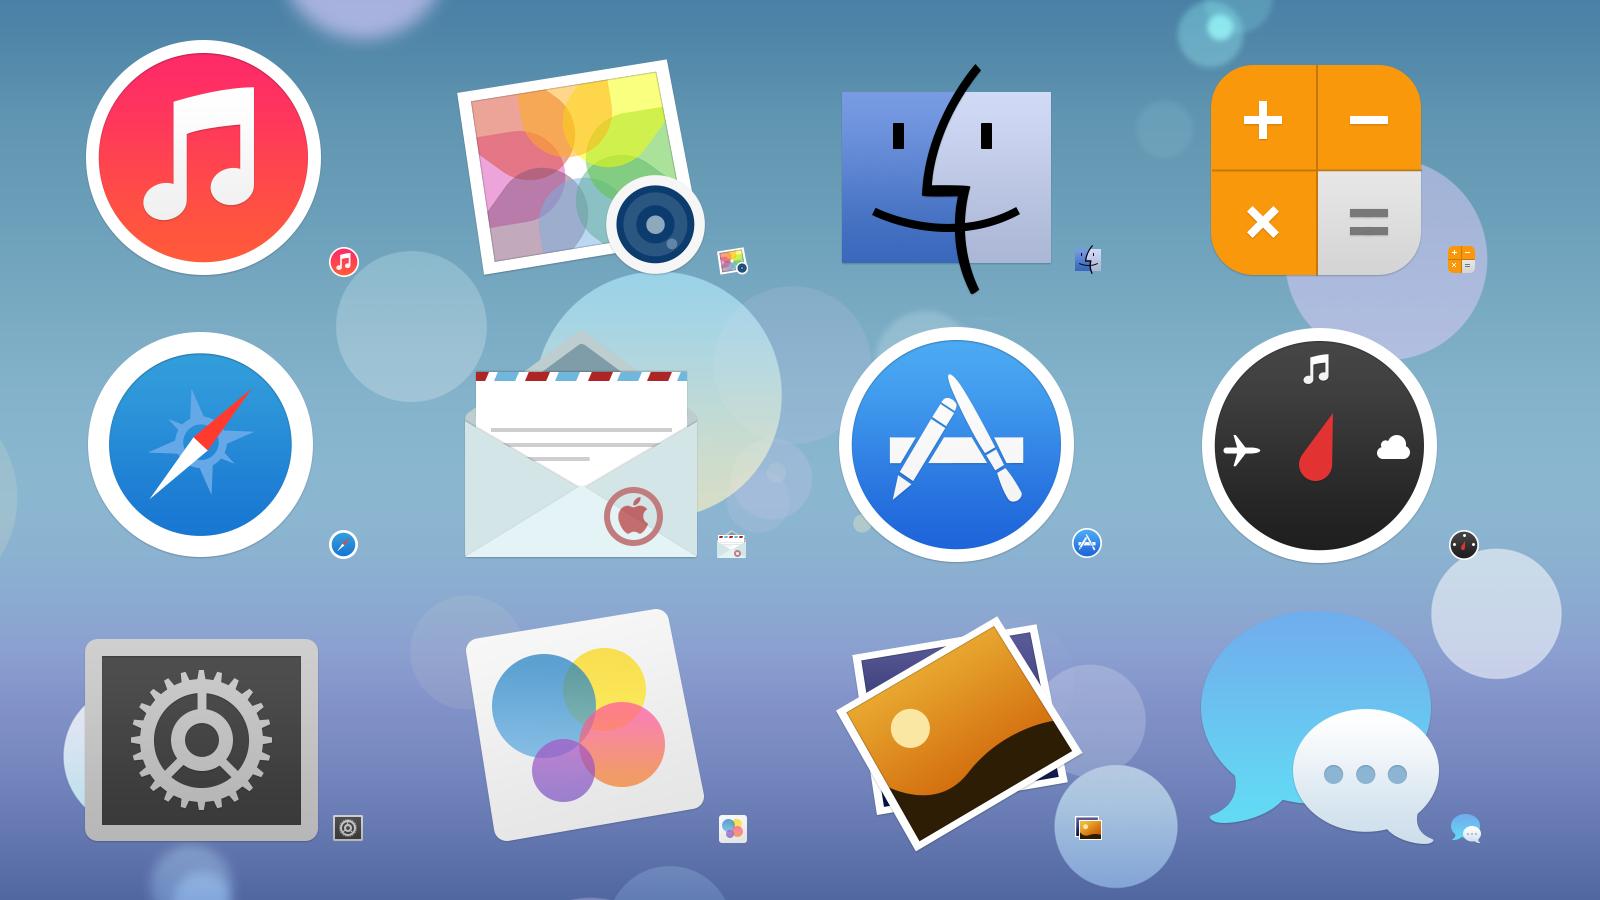 how to change dock style on mac sierra